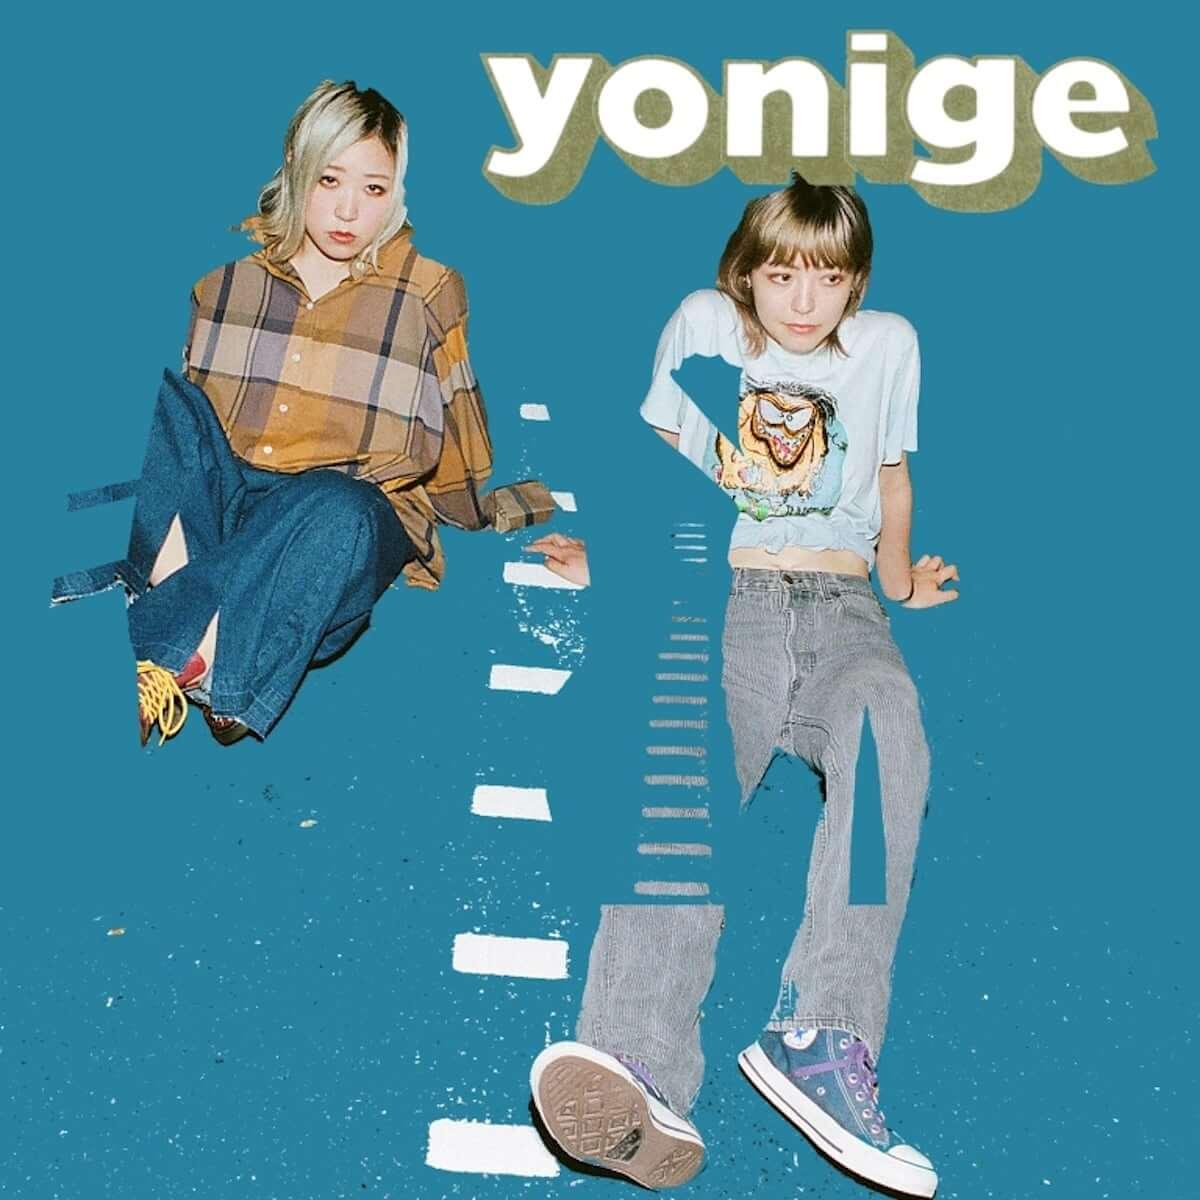 Qetic×yonige全フェス追っかけライブレポ&インタビュー|BAYCAMP編 music180921_yonige_2-1200x1200